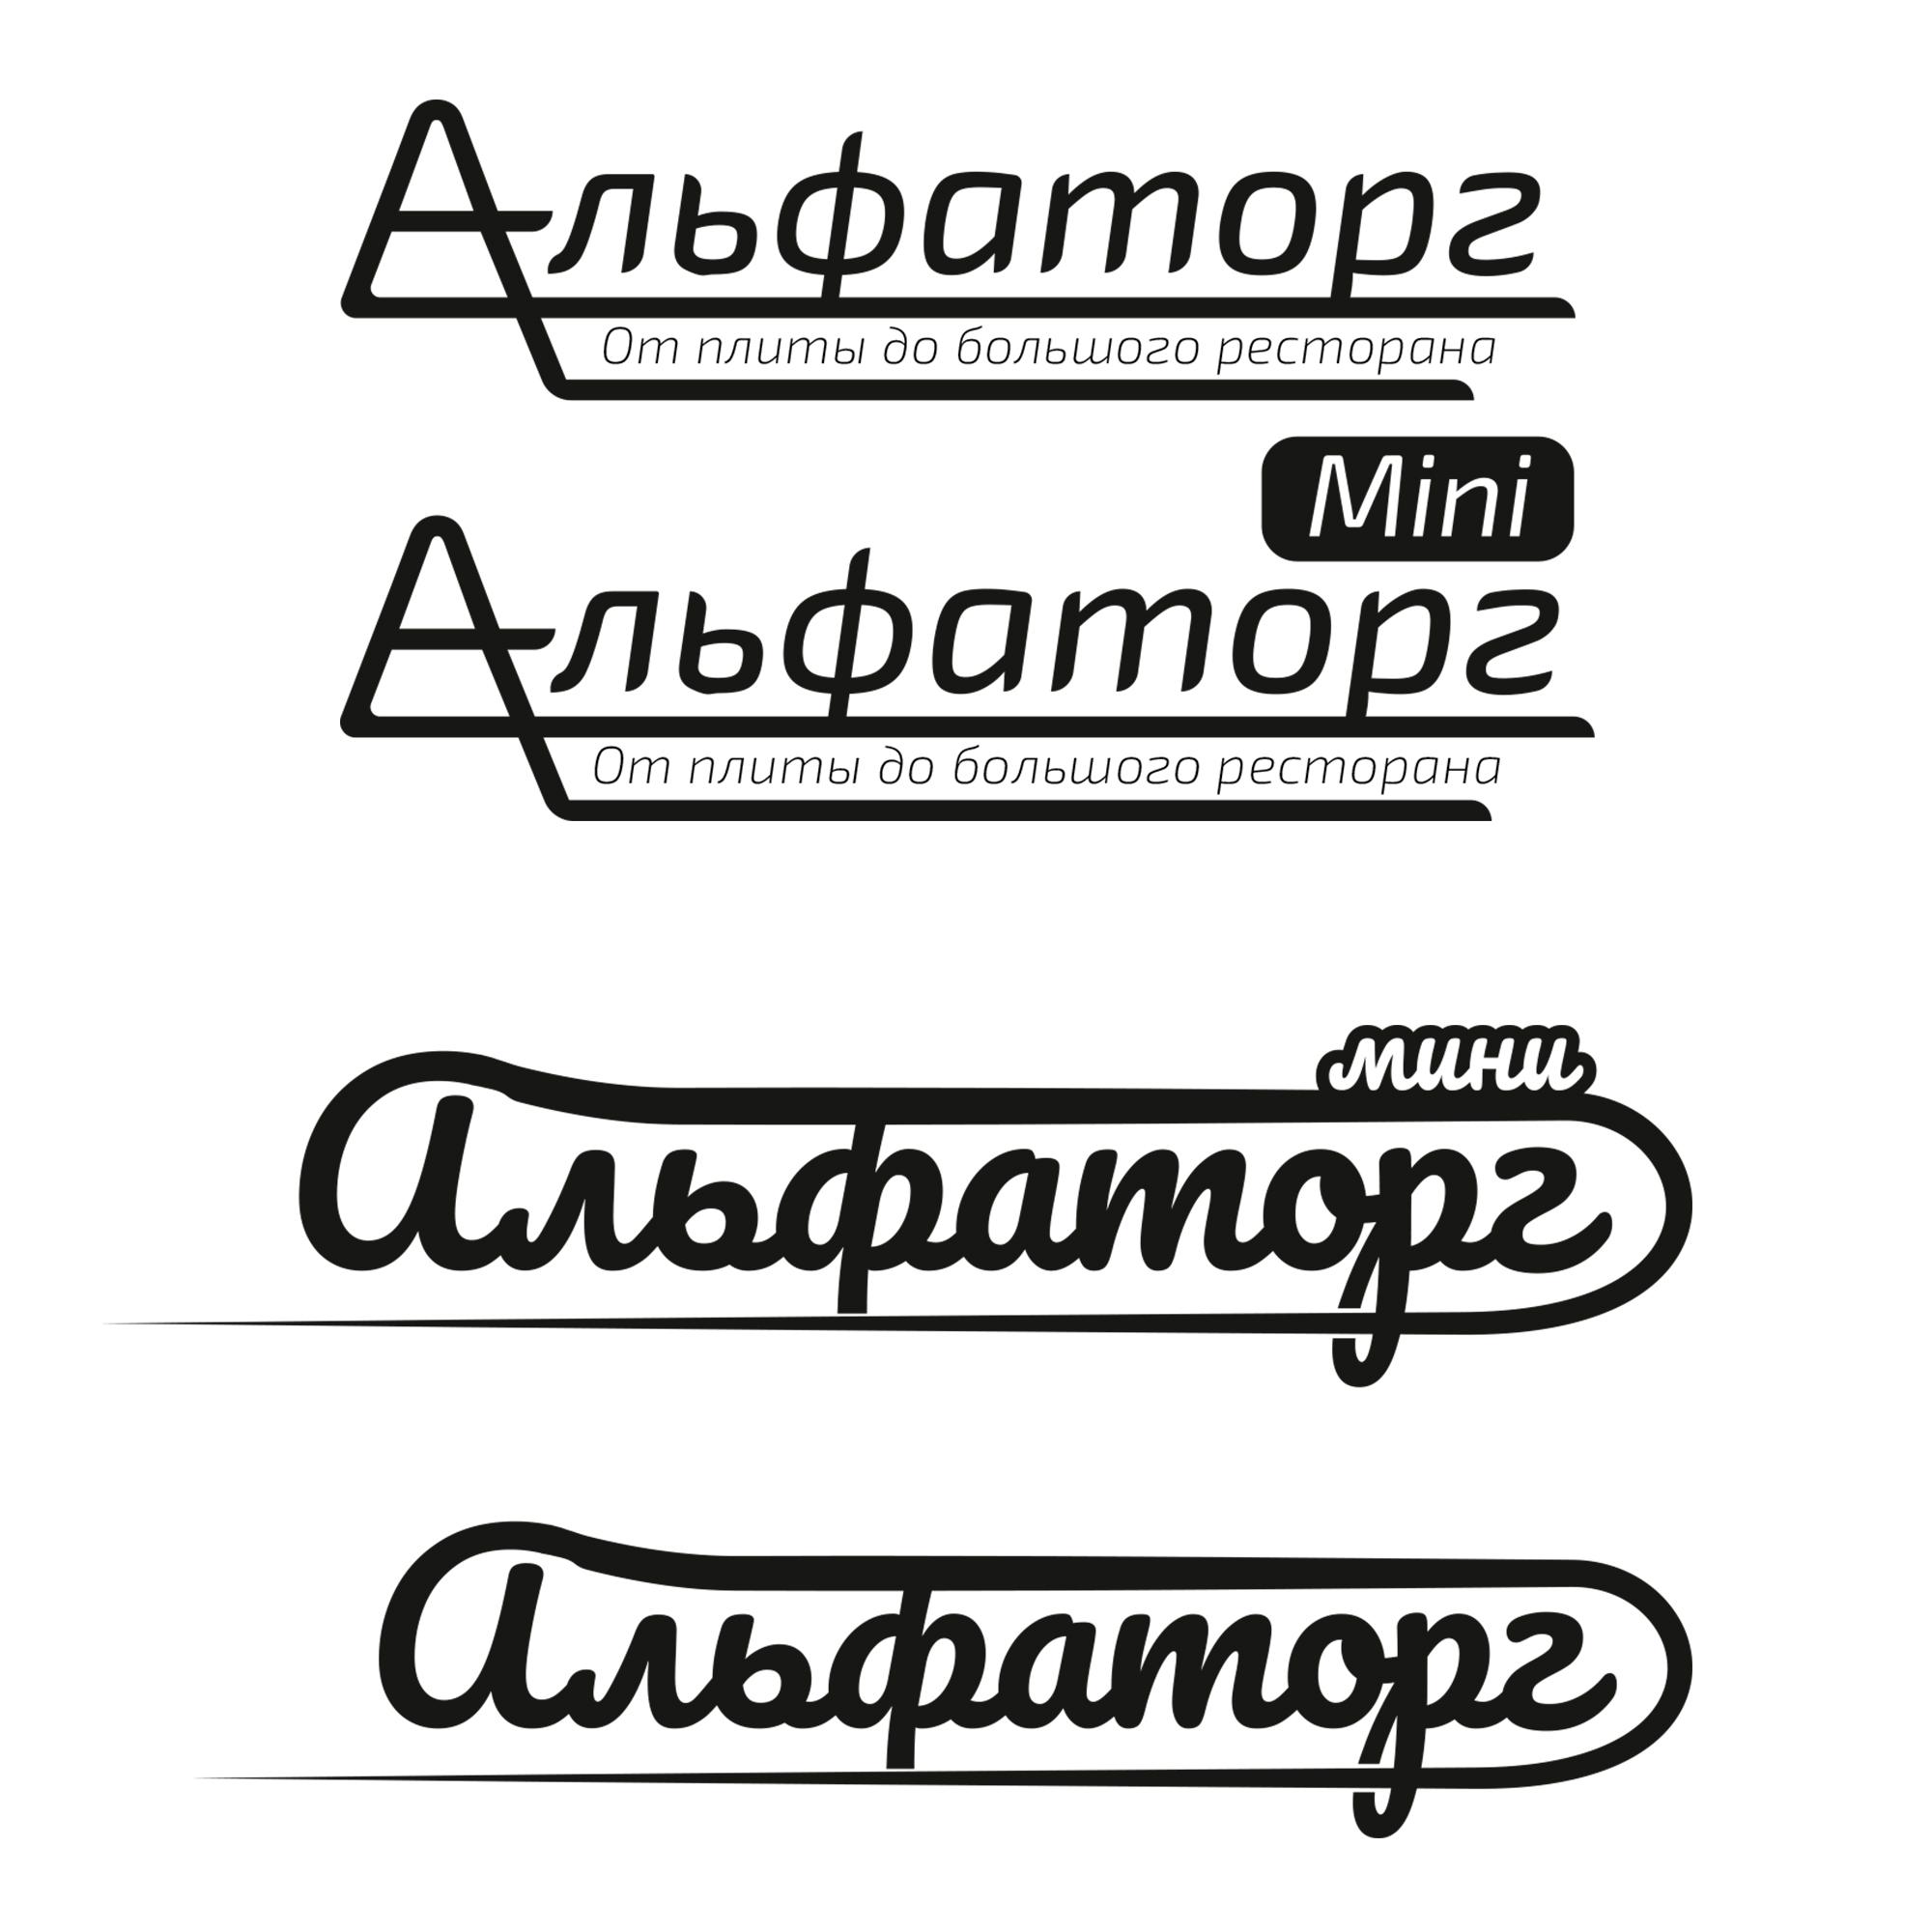 Логотип и фирменный стиль фото f_7255efc8f1c0d524.jpg